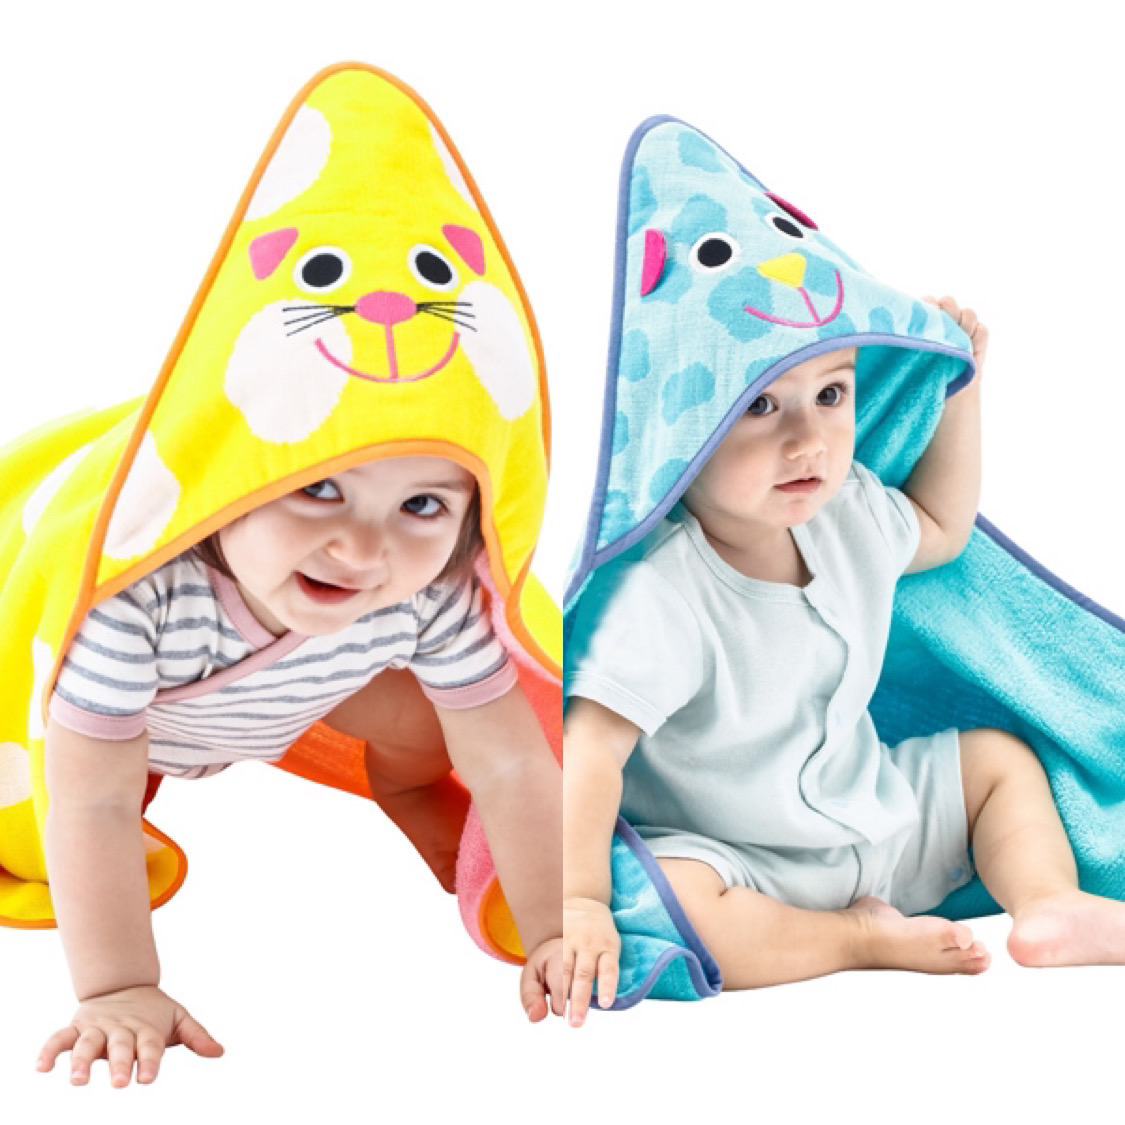 f:id:baby-alice:20201126142840j:plain